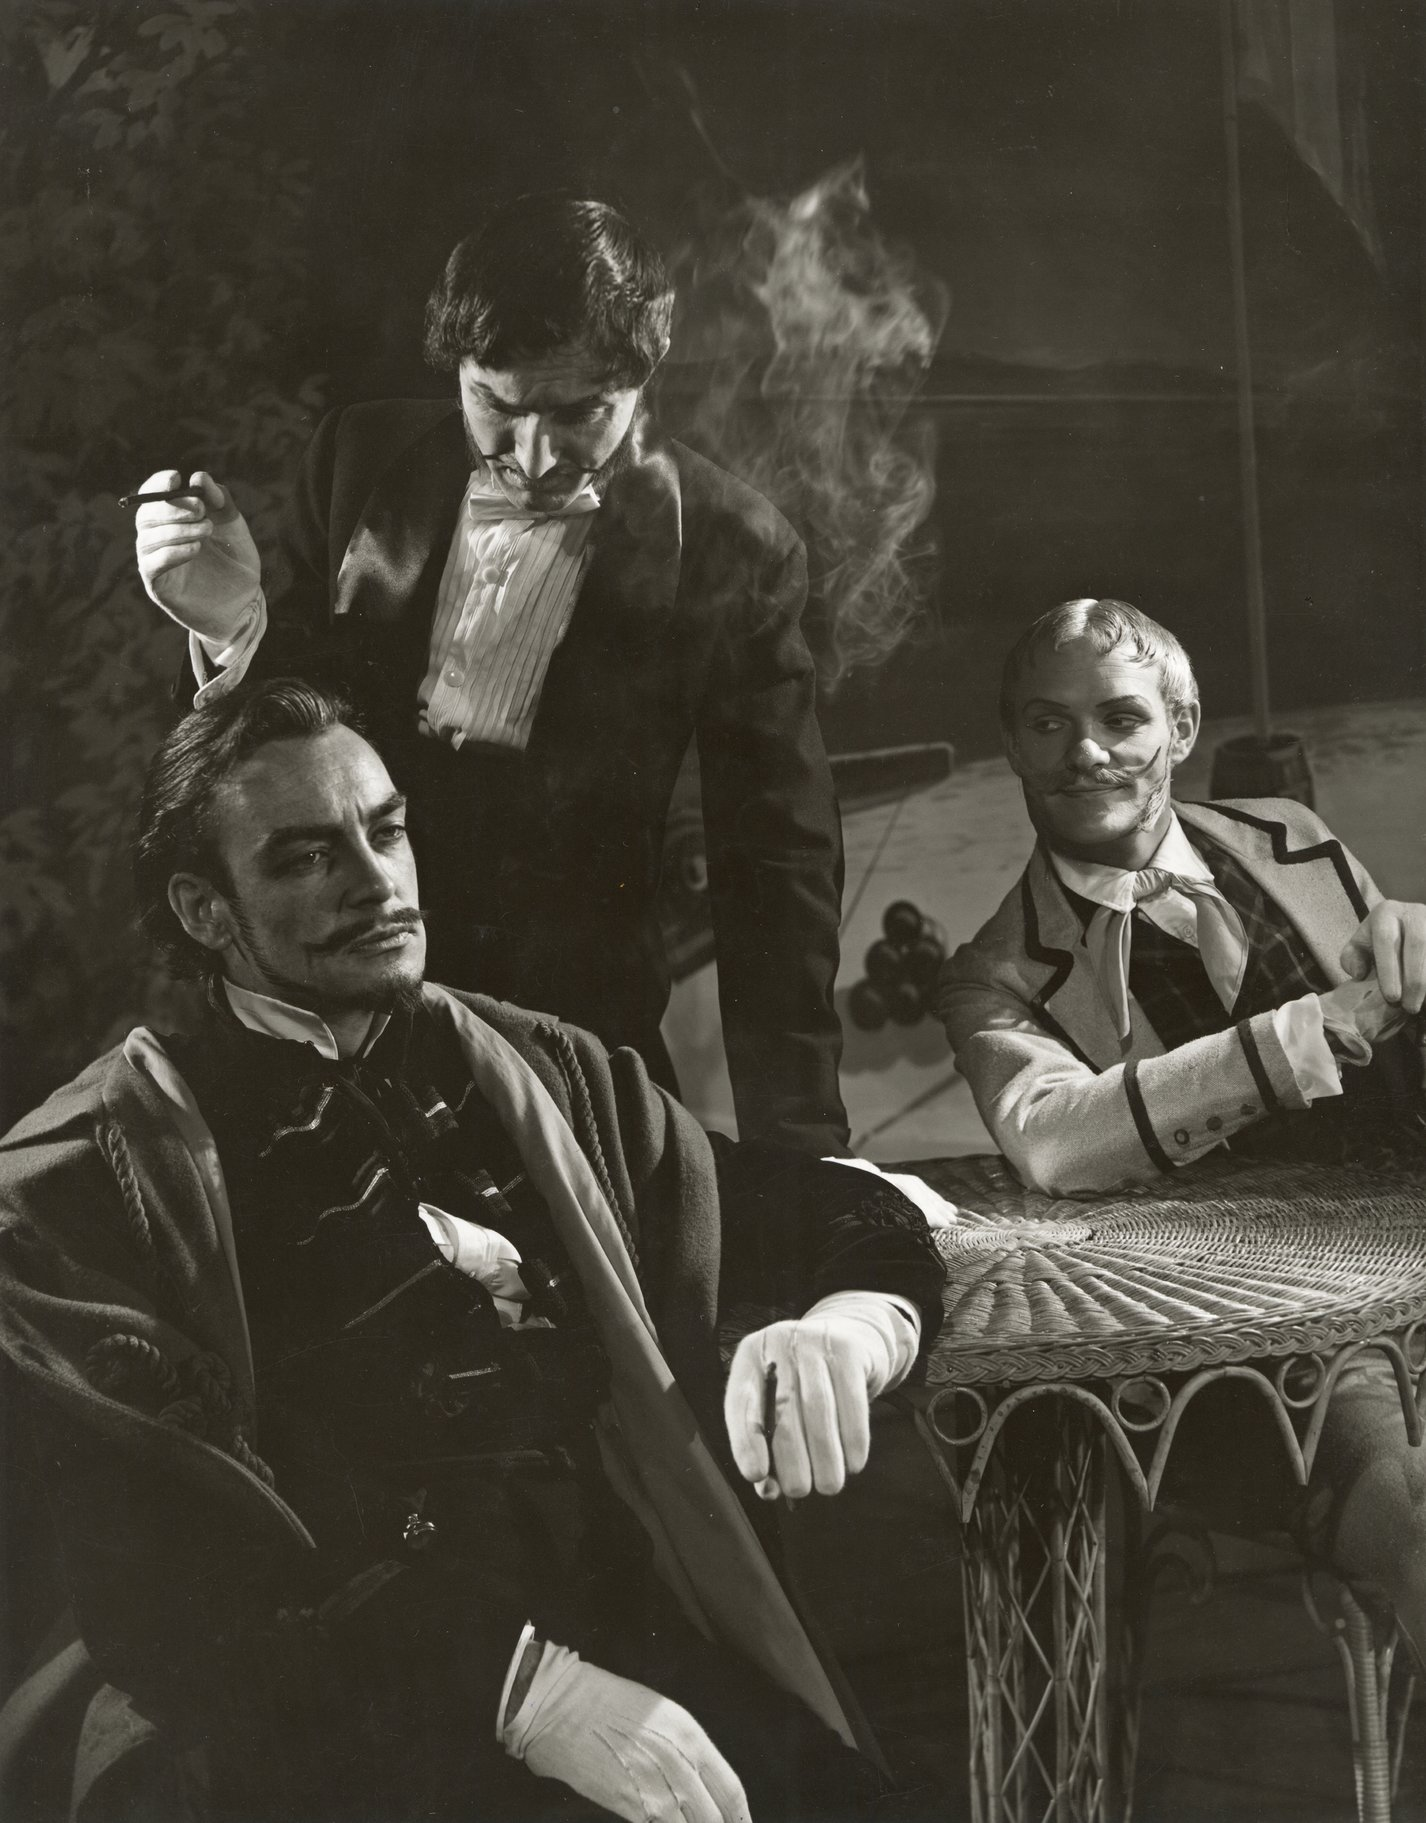 Three men conspire around a round table.